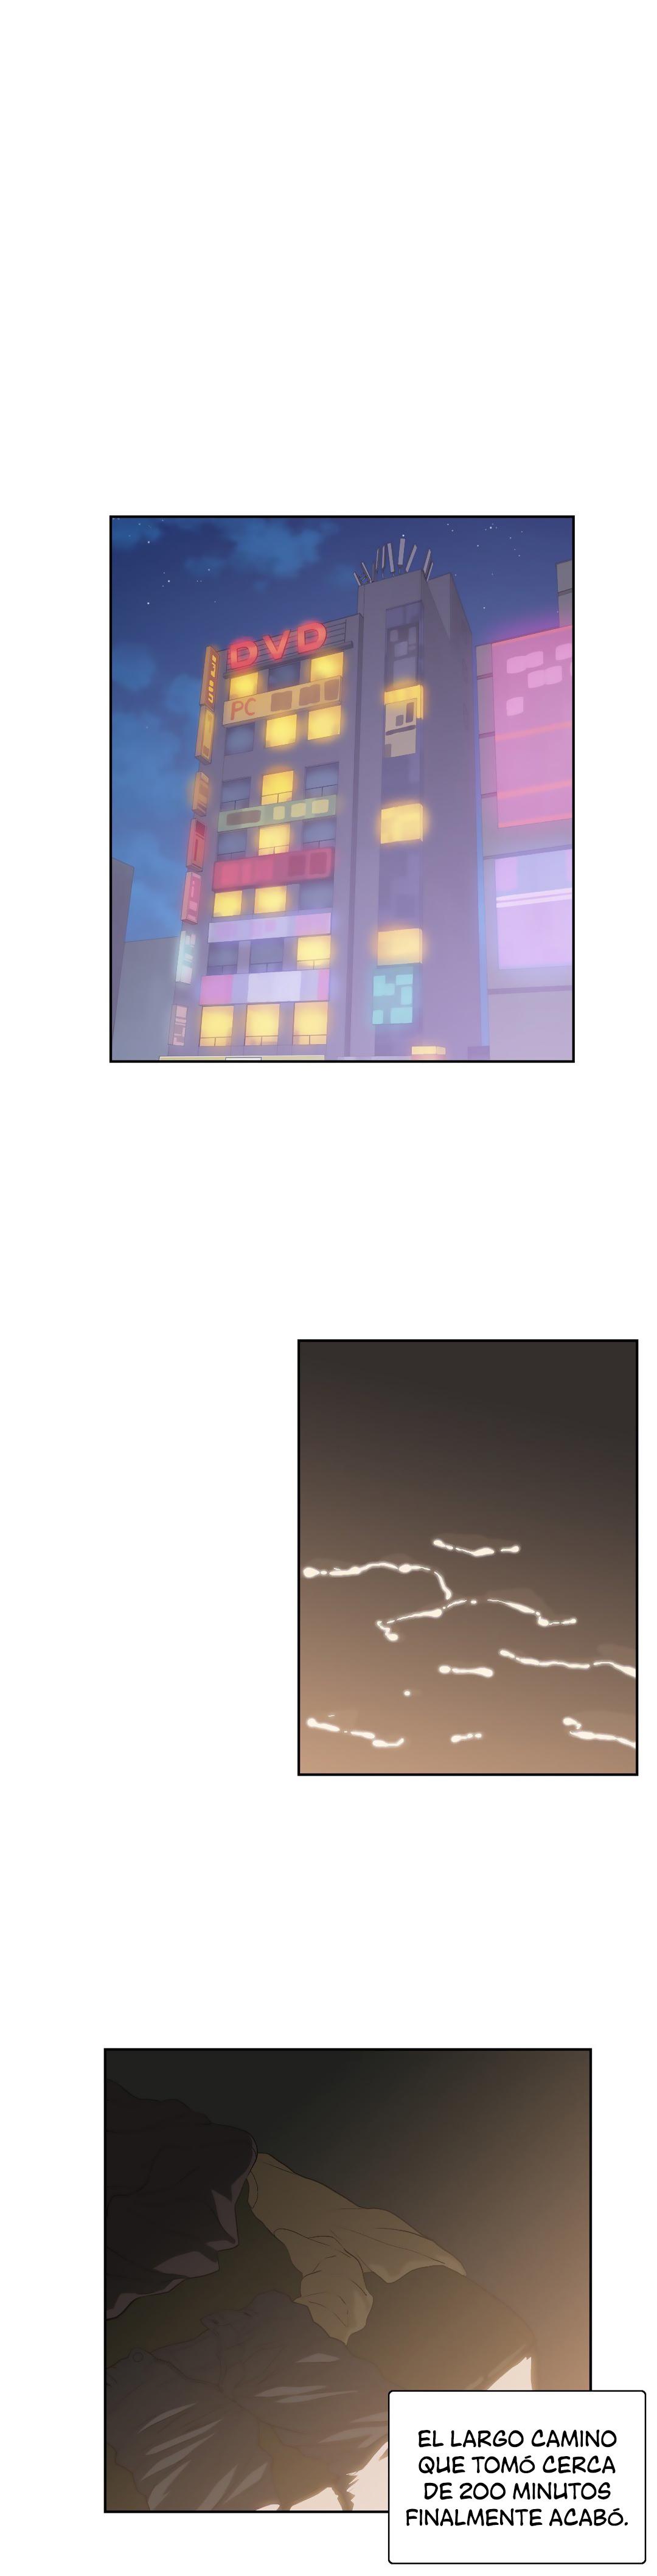 Set de imagenes